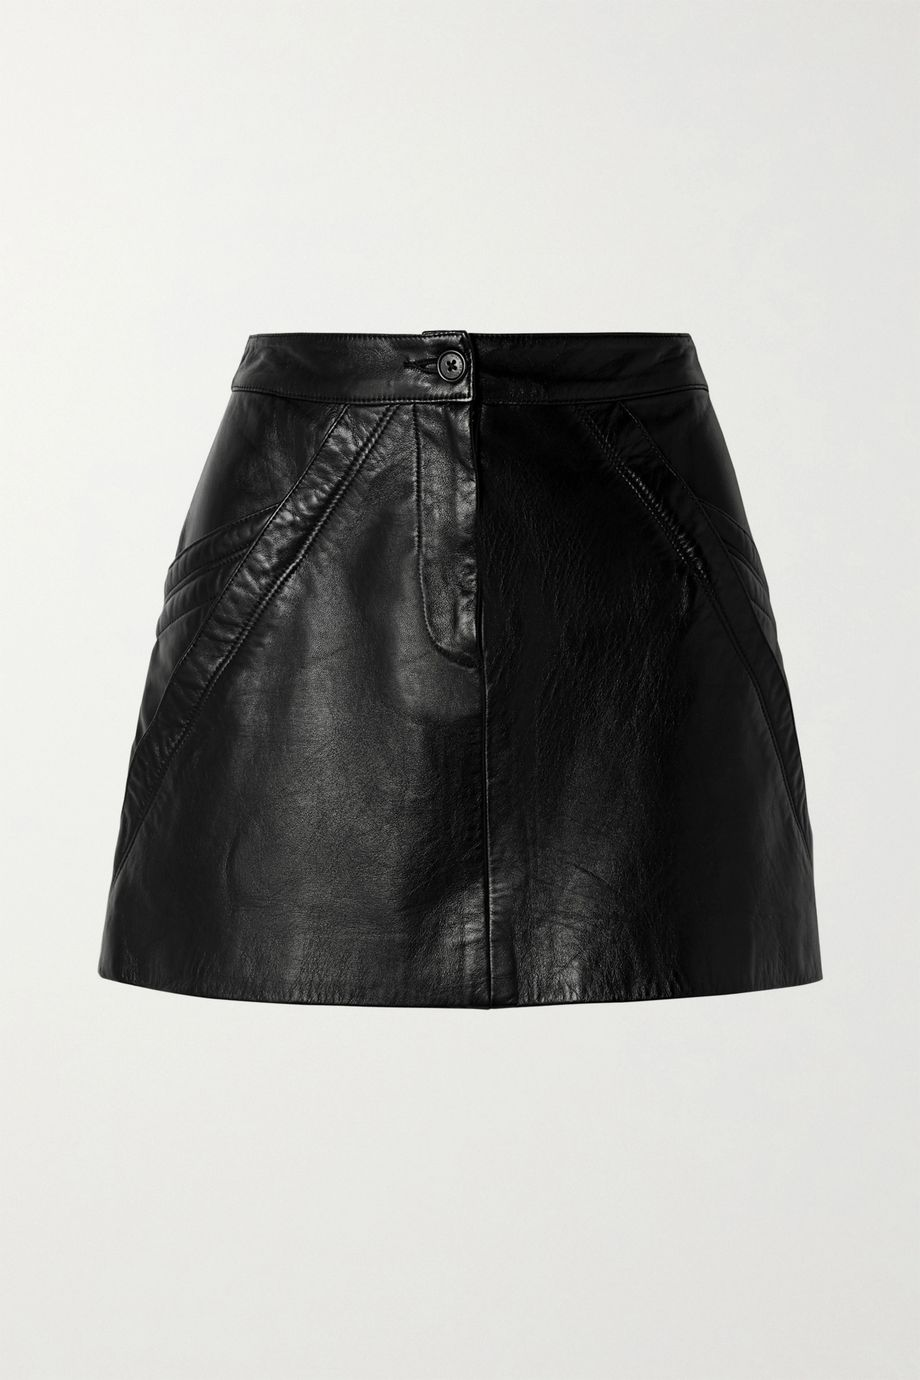 Nili Lotan Kade paneled leather mini skirt